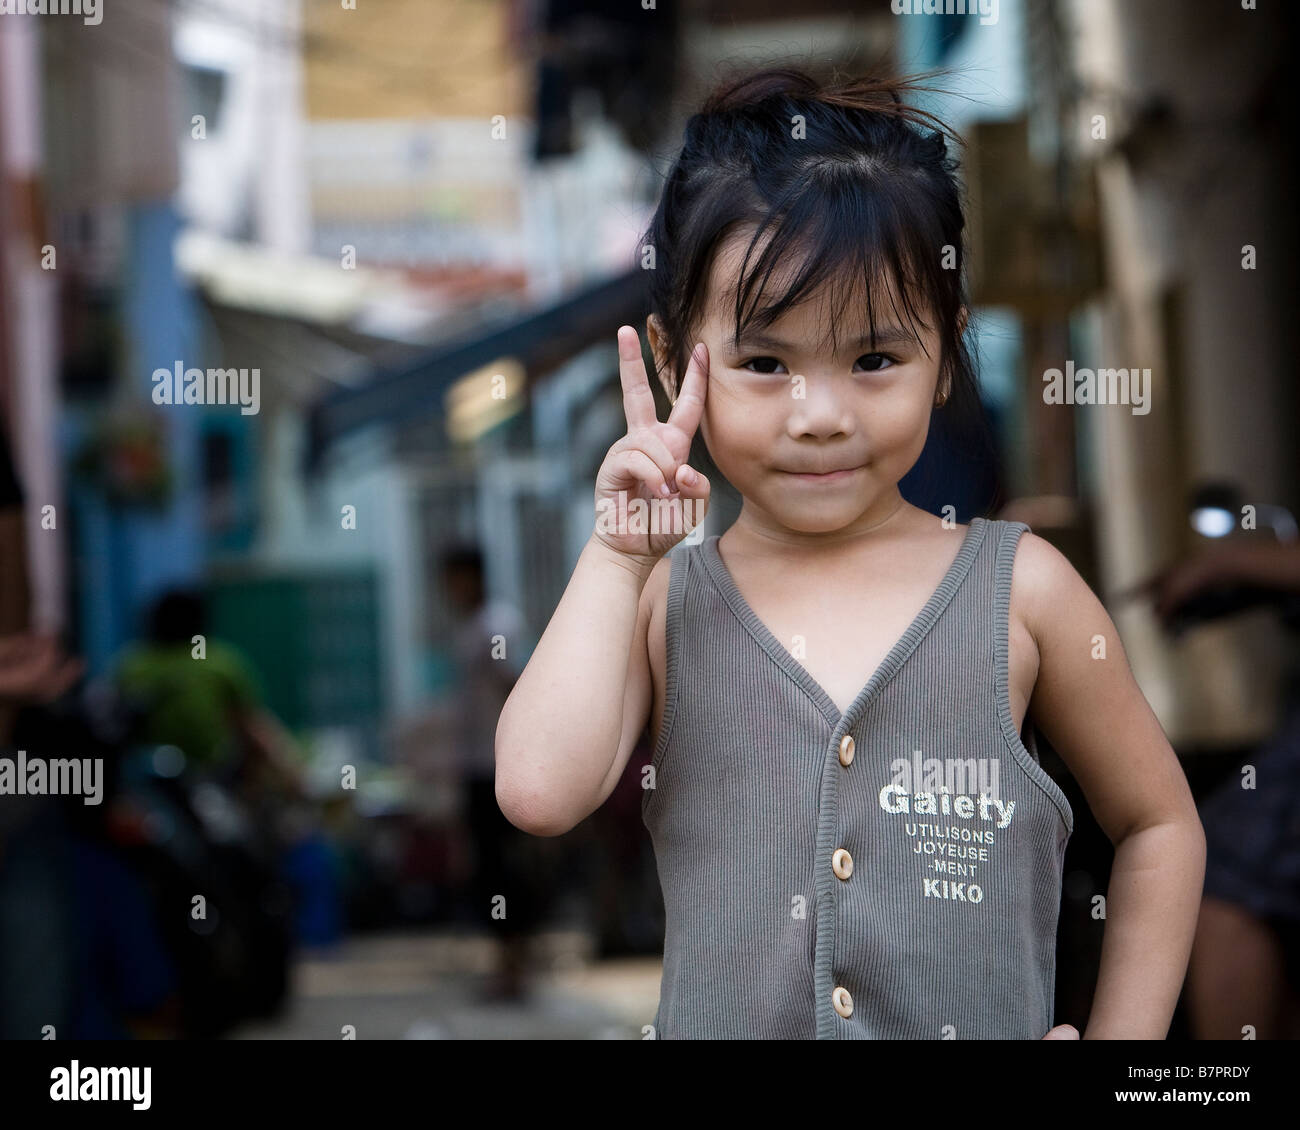 Vietnam Girl Child Stock Photos & Vietnam Girl Child Stock